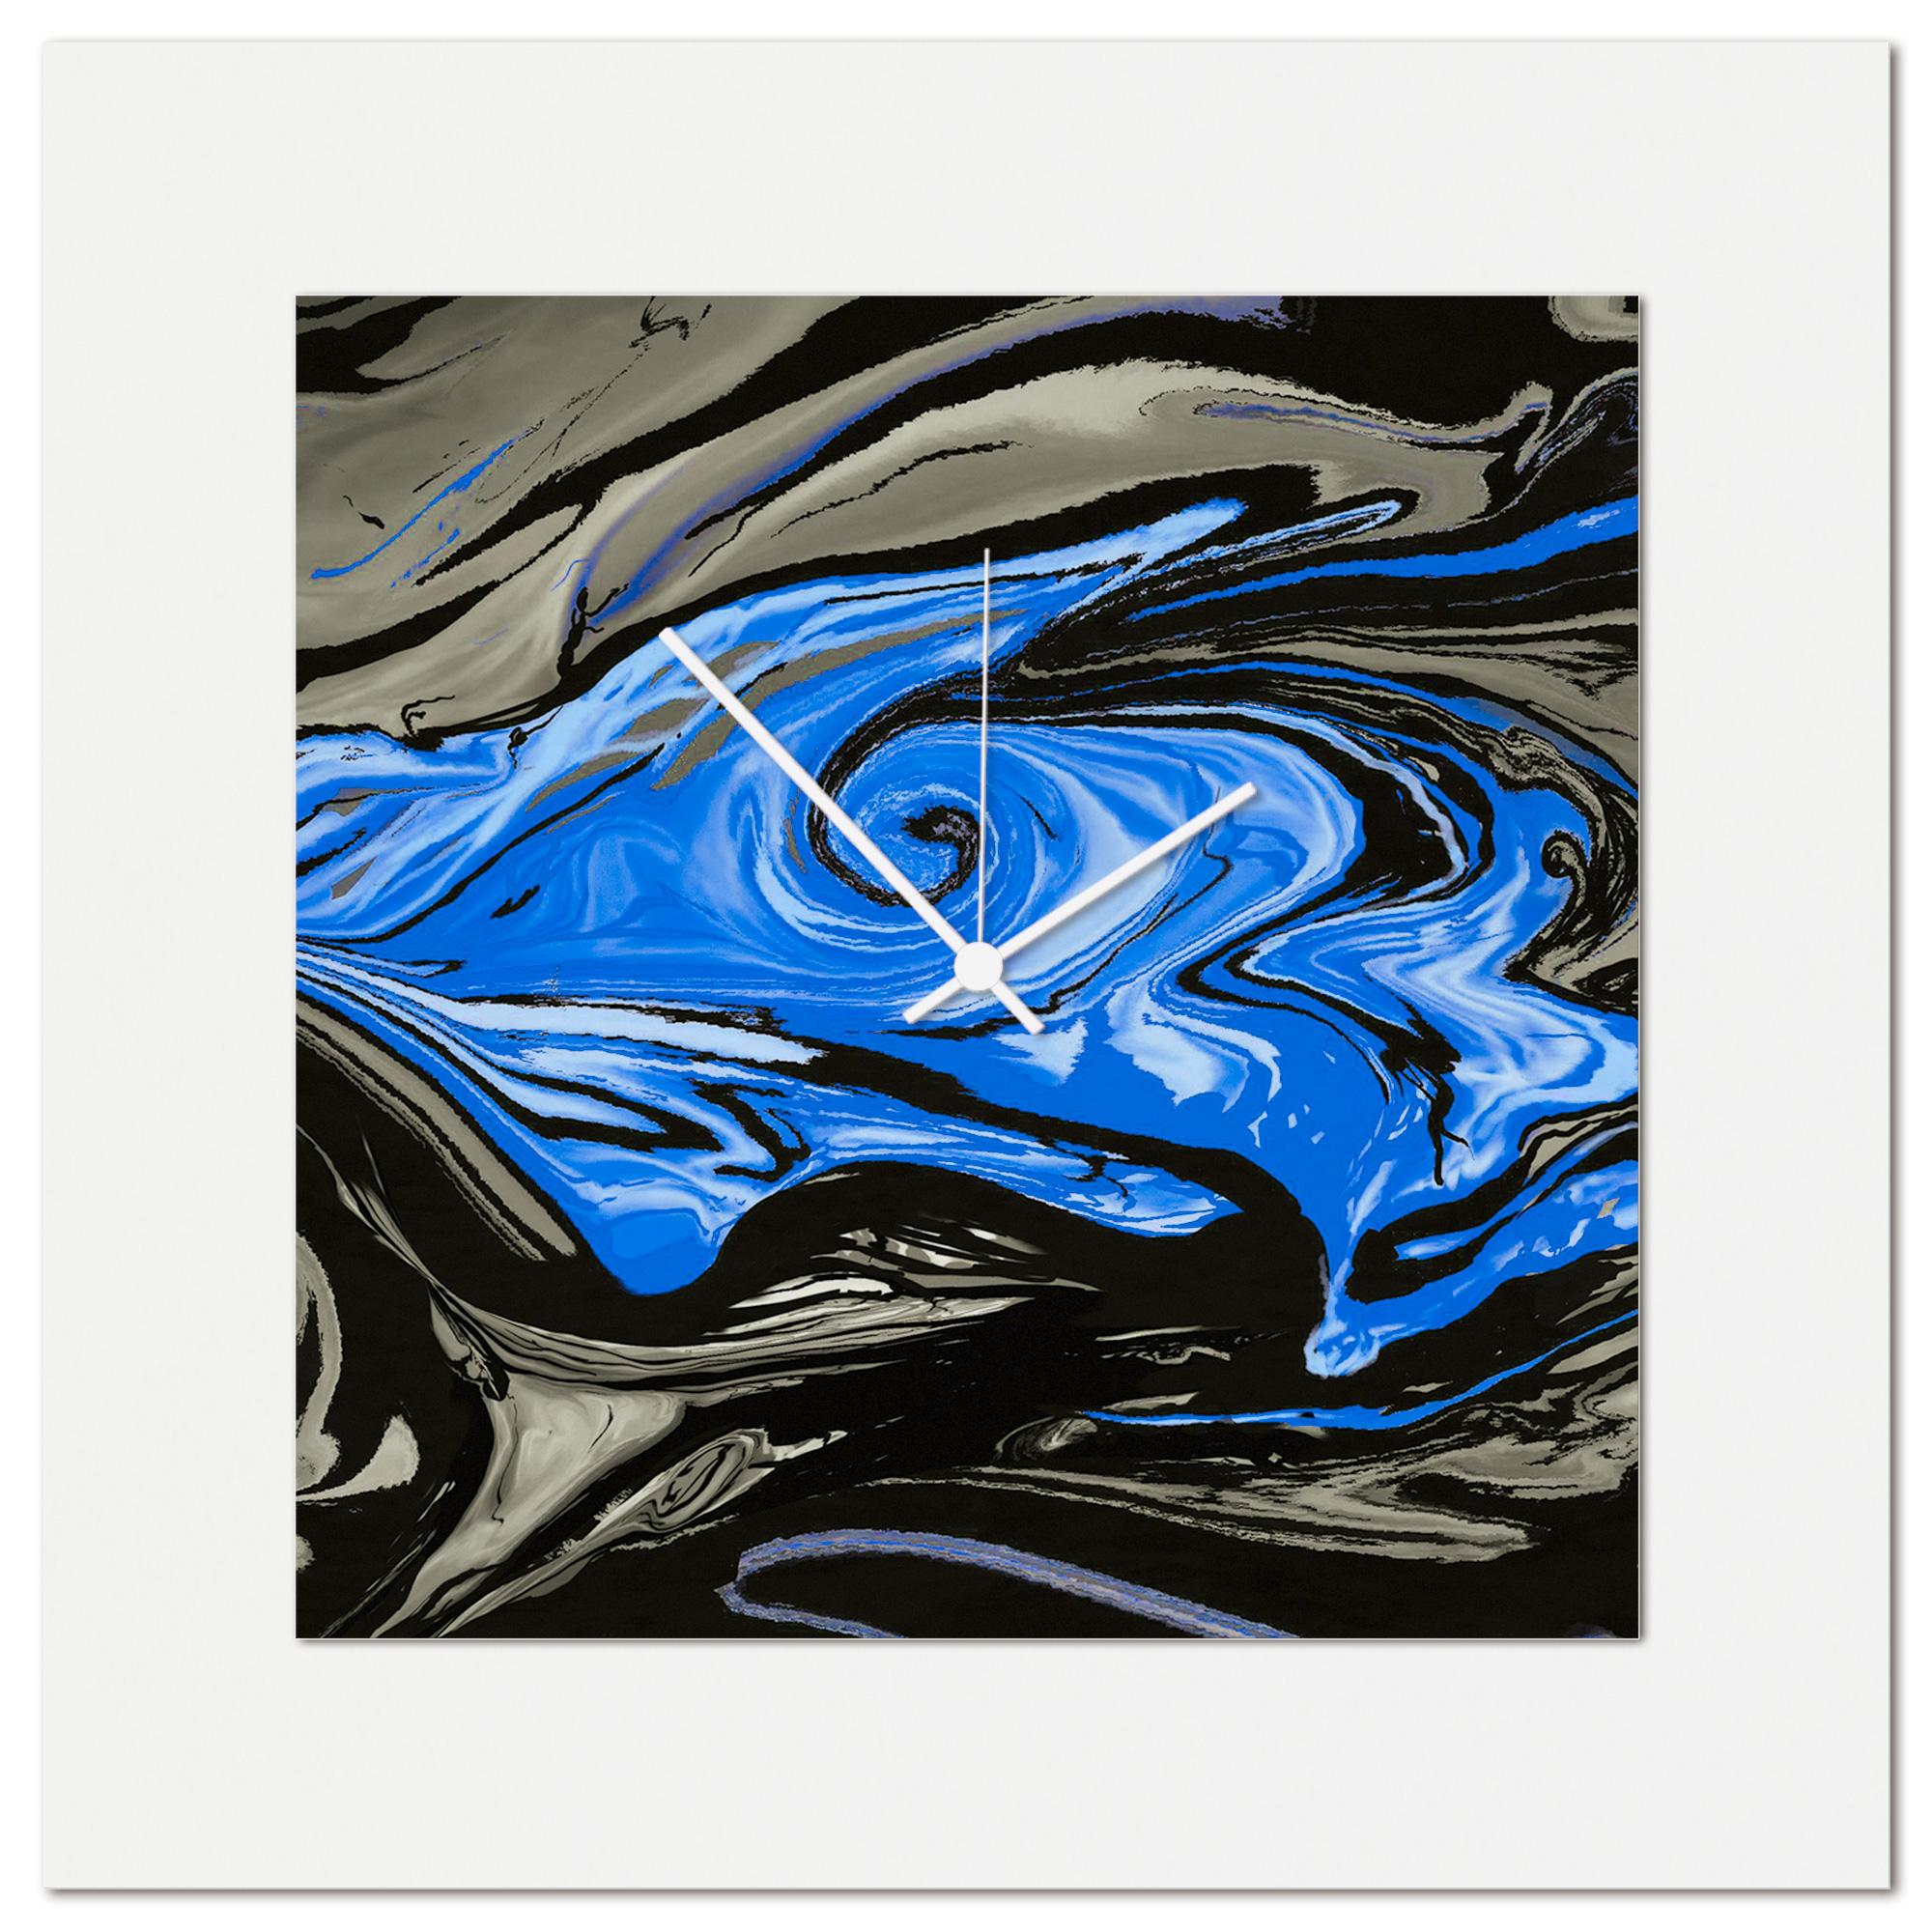 Blue Swirl Clock by Eric Waddington Multimedia Abstract Wall Decor